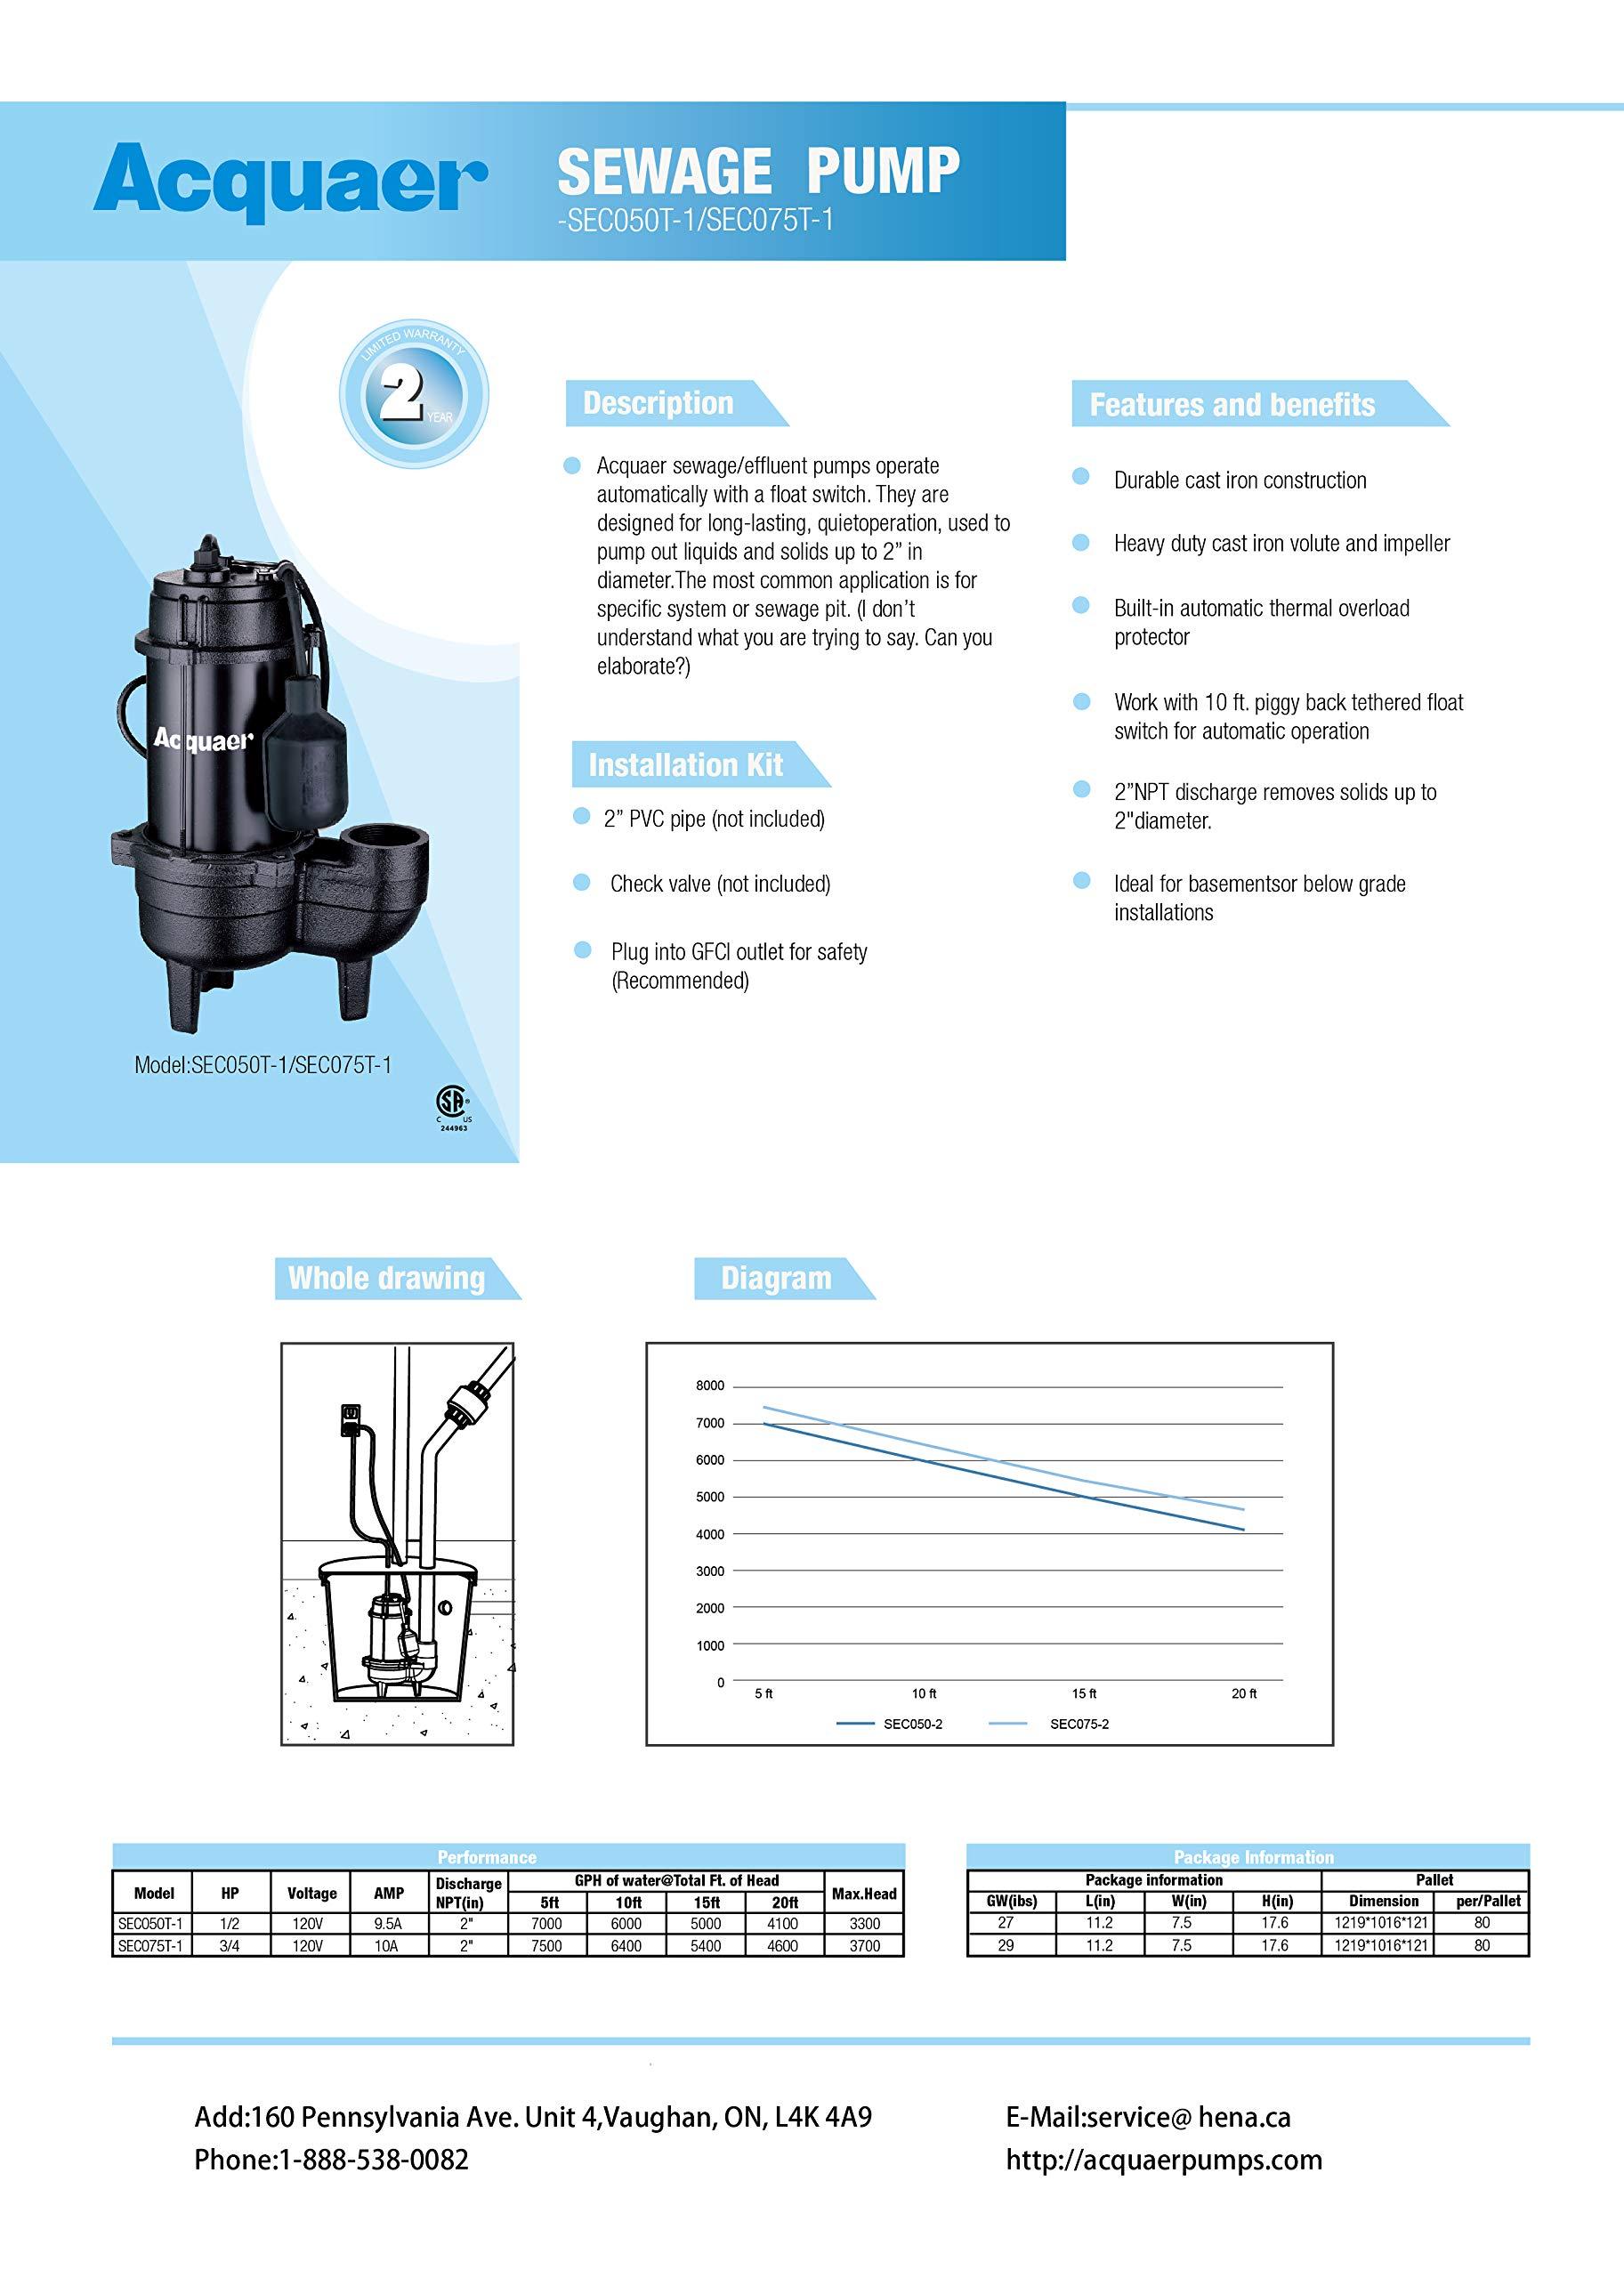 Acquaer 3/4 HP Cast iron Sewage Pump+Piggy back switch by Acquaer